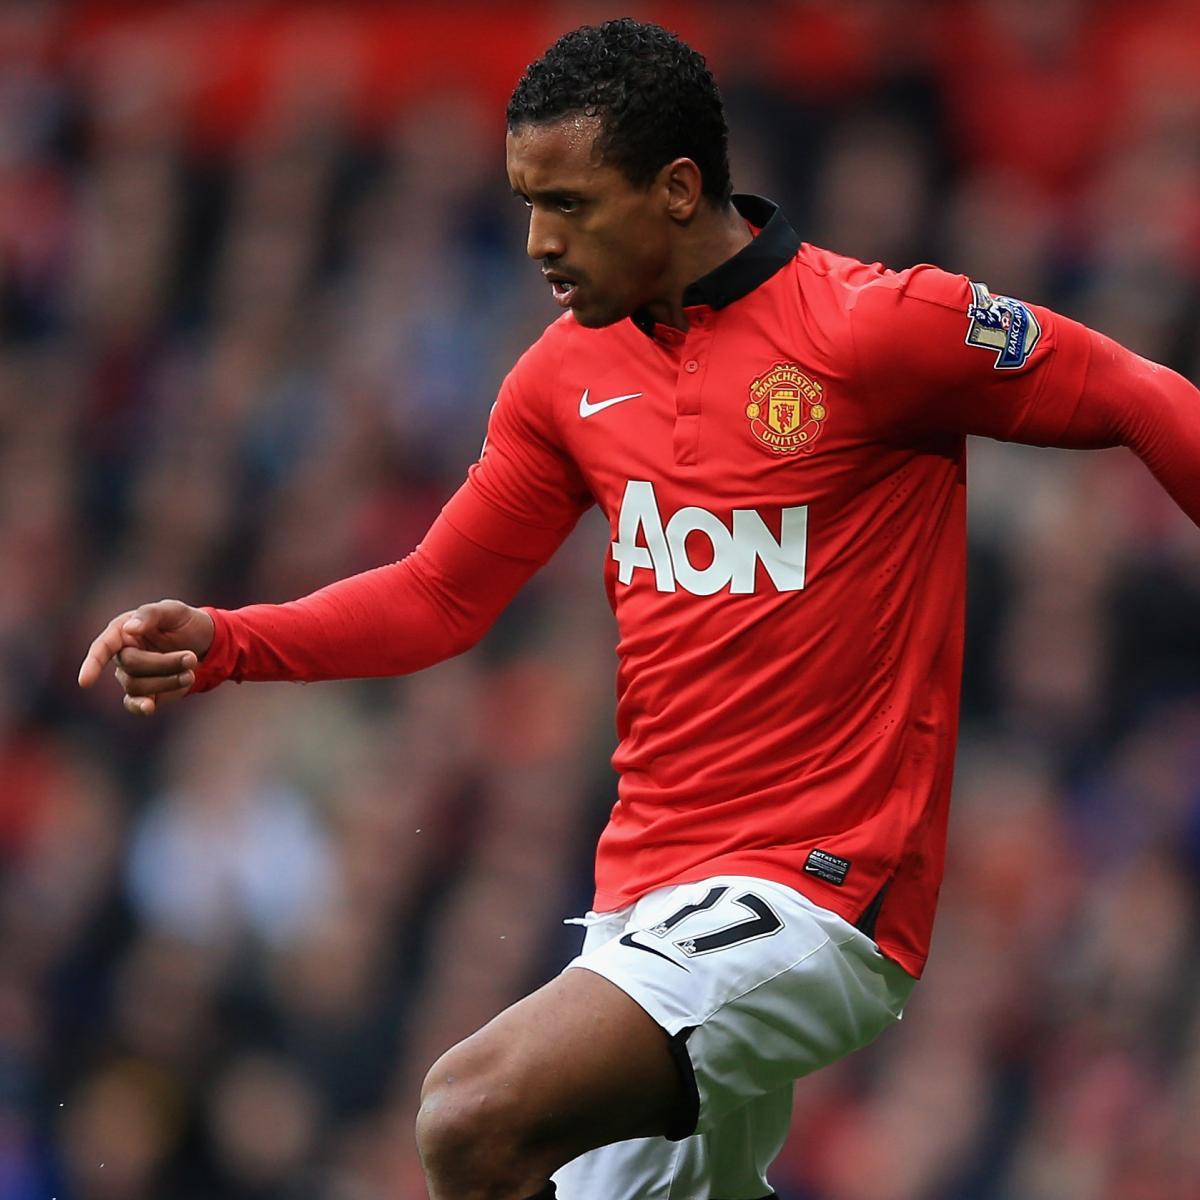 Nani Injury: Updates on Manchester United Star's Hamstring ...